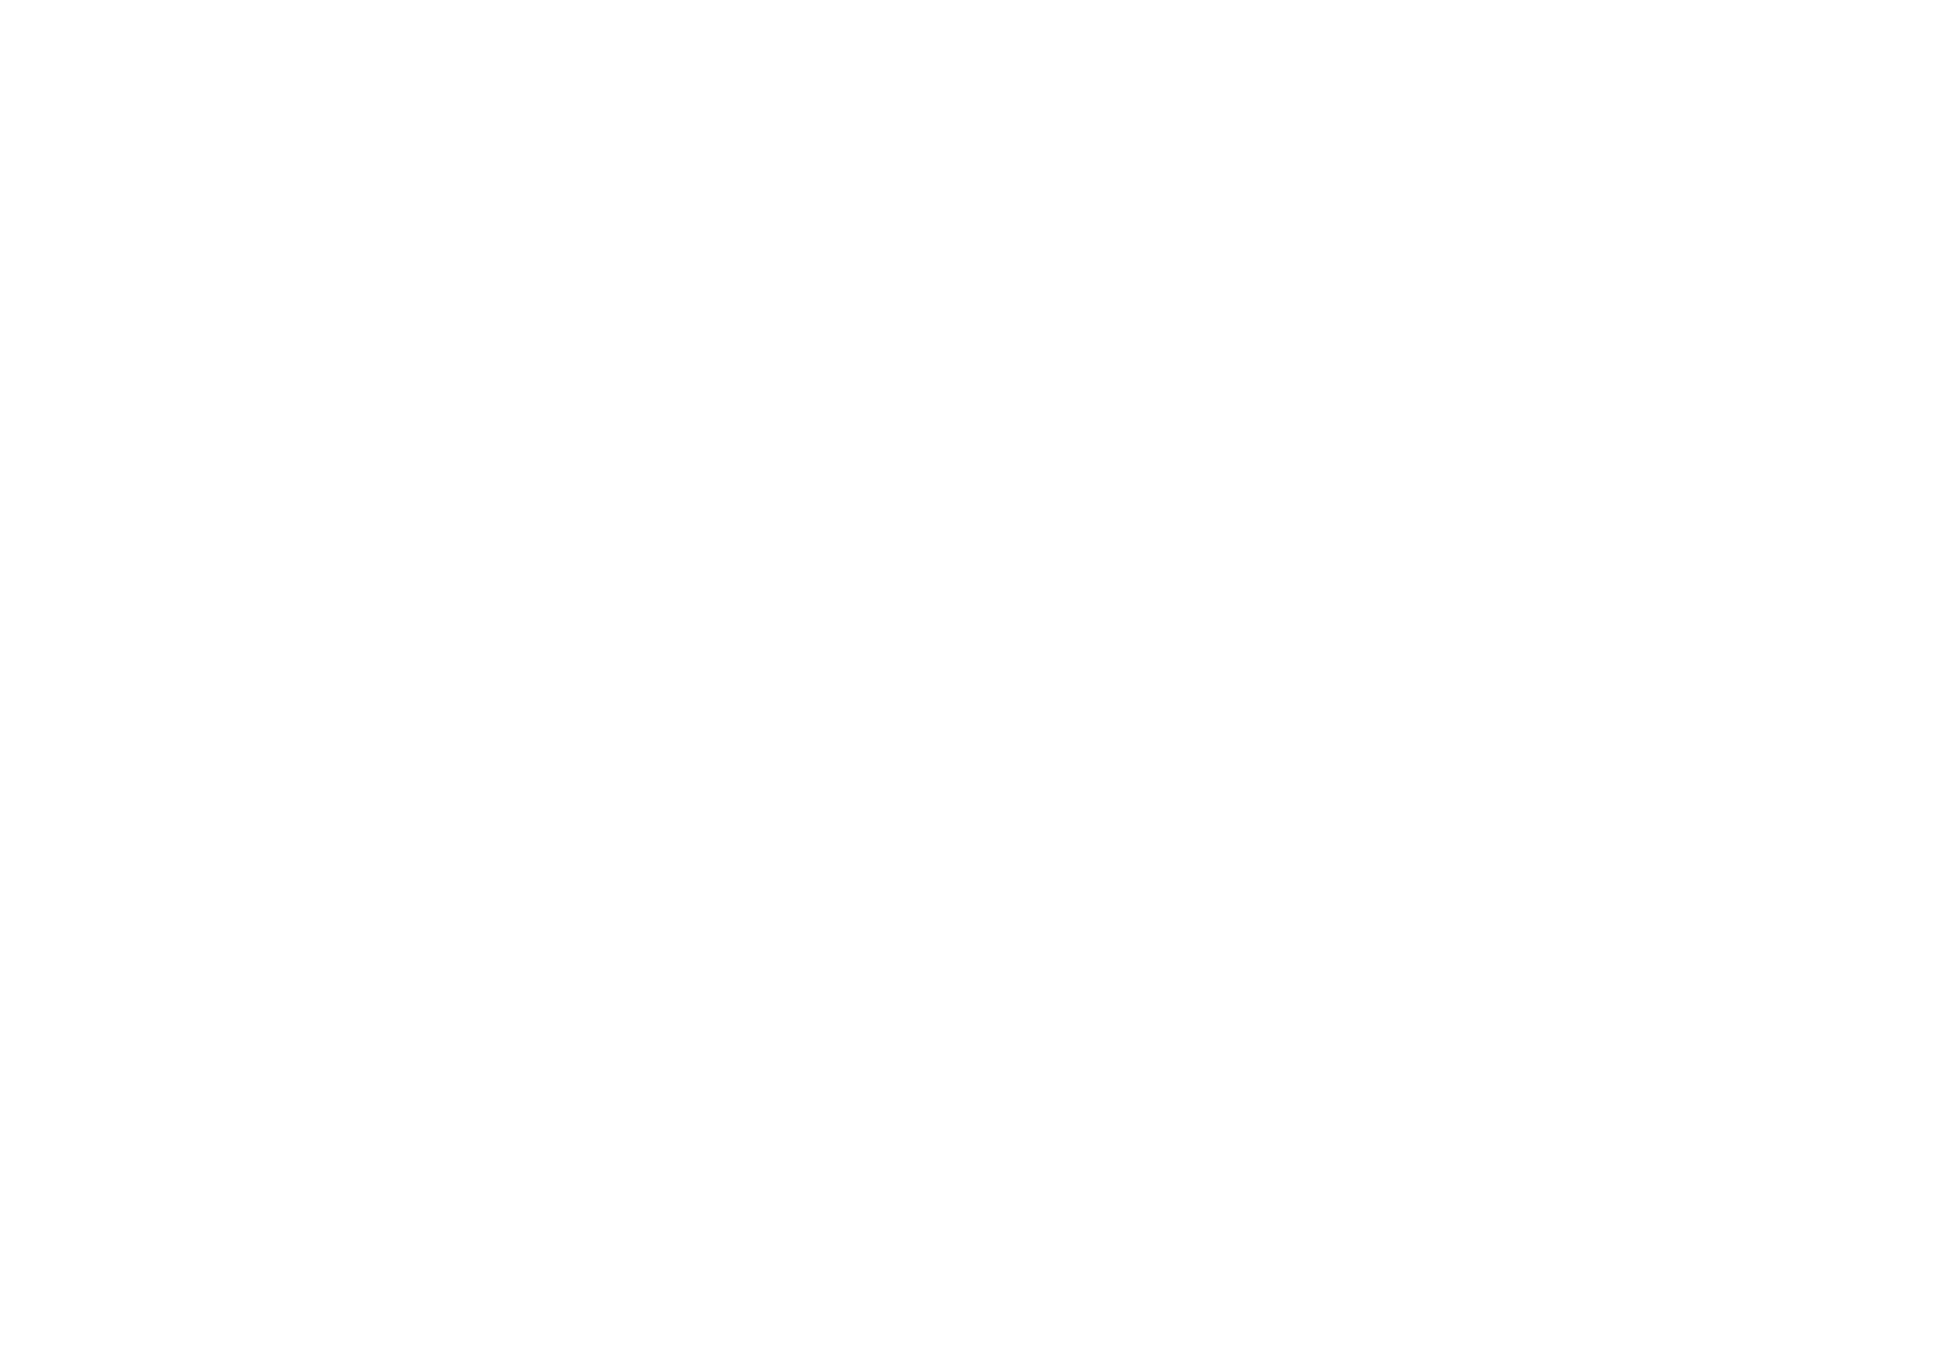 tonka-logo-white.png